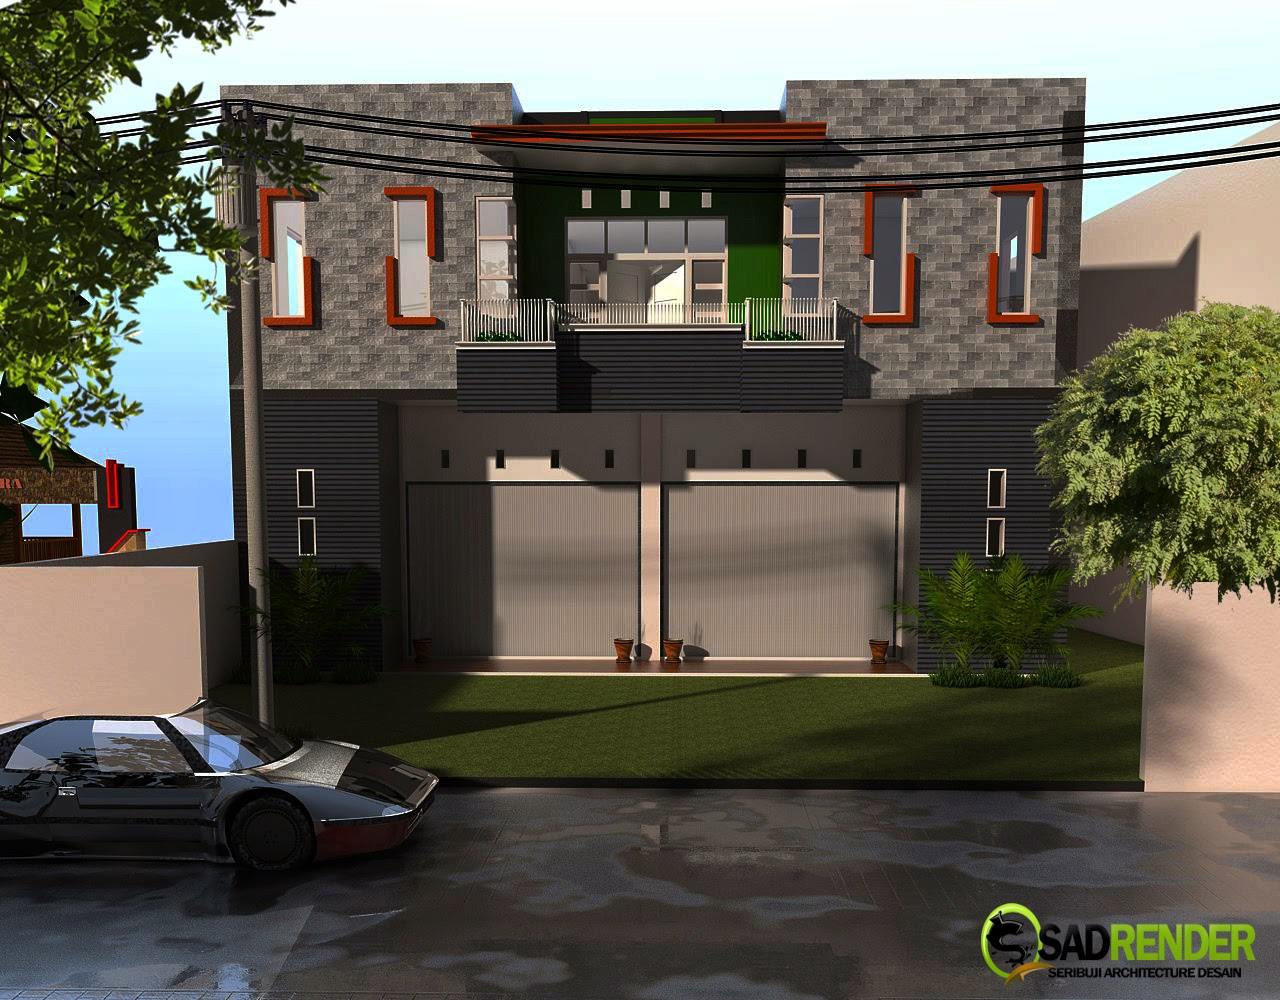 Jasa Desain Bangunan, desain bangunan, arsitek, jasa arsitek, jasa bangunan, JASA DESAIN